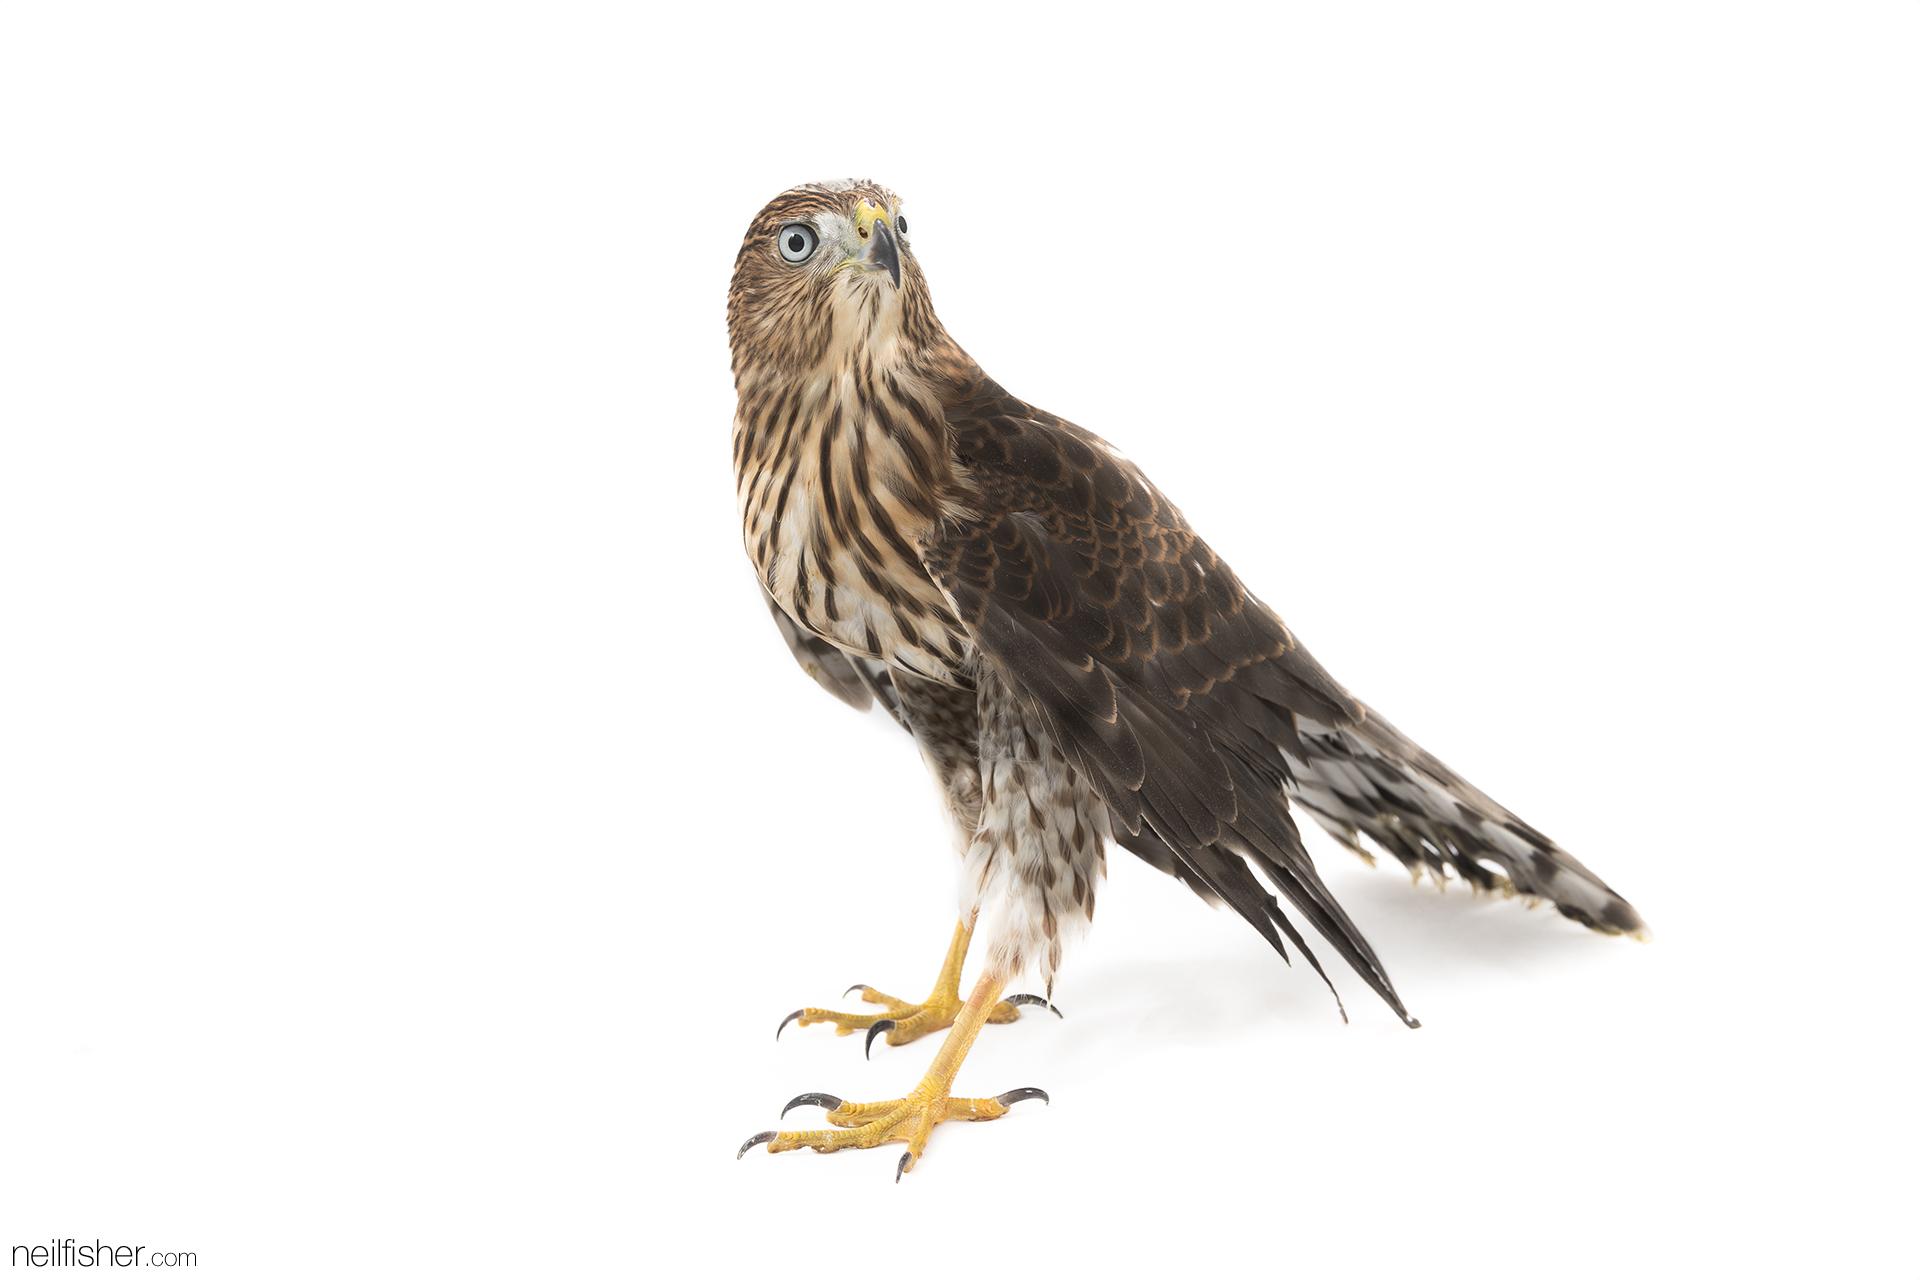 20171012 - Coopers Hawk (1) - NeilFisher.jpg